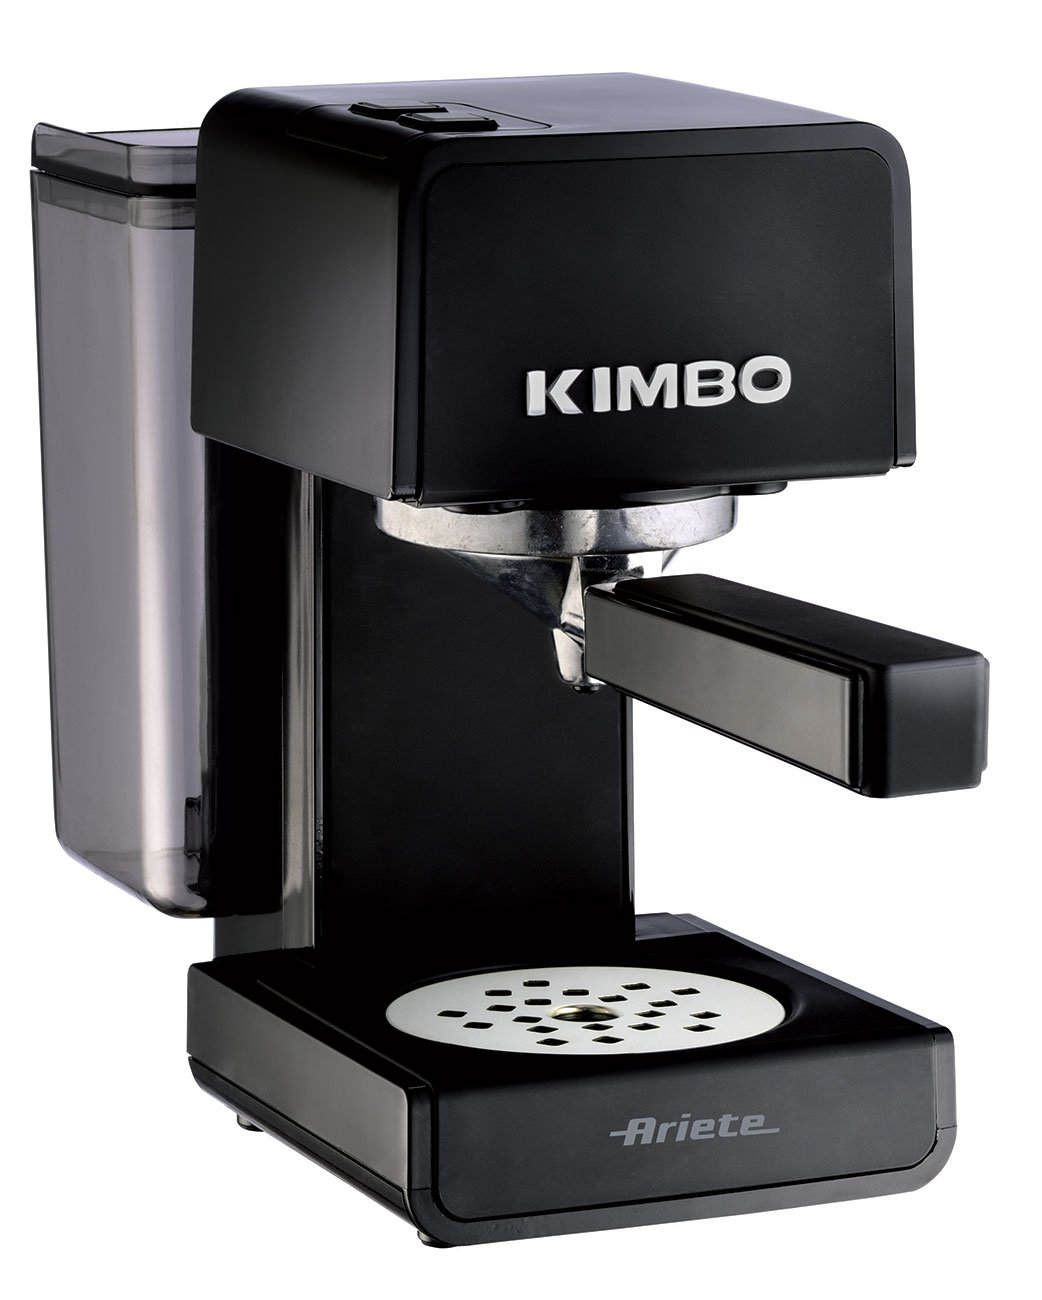 Ariete 1364 Kimbo Macchina da Caffè, Nero/Crema